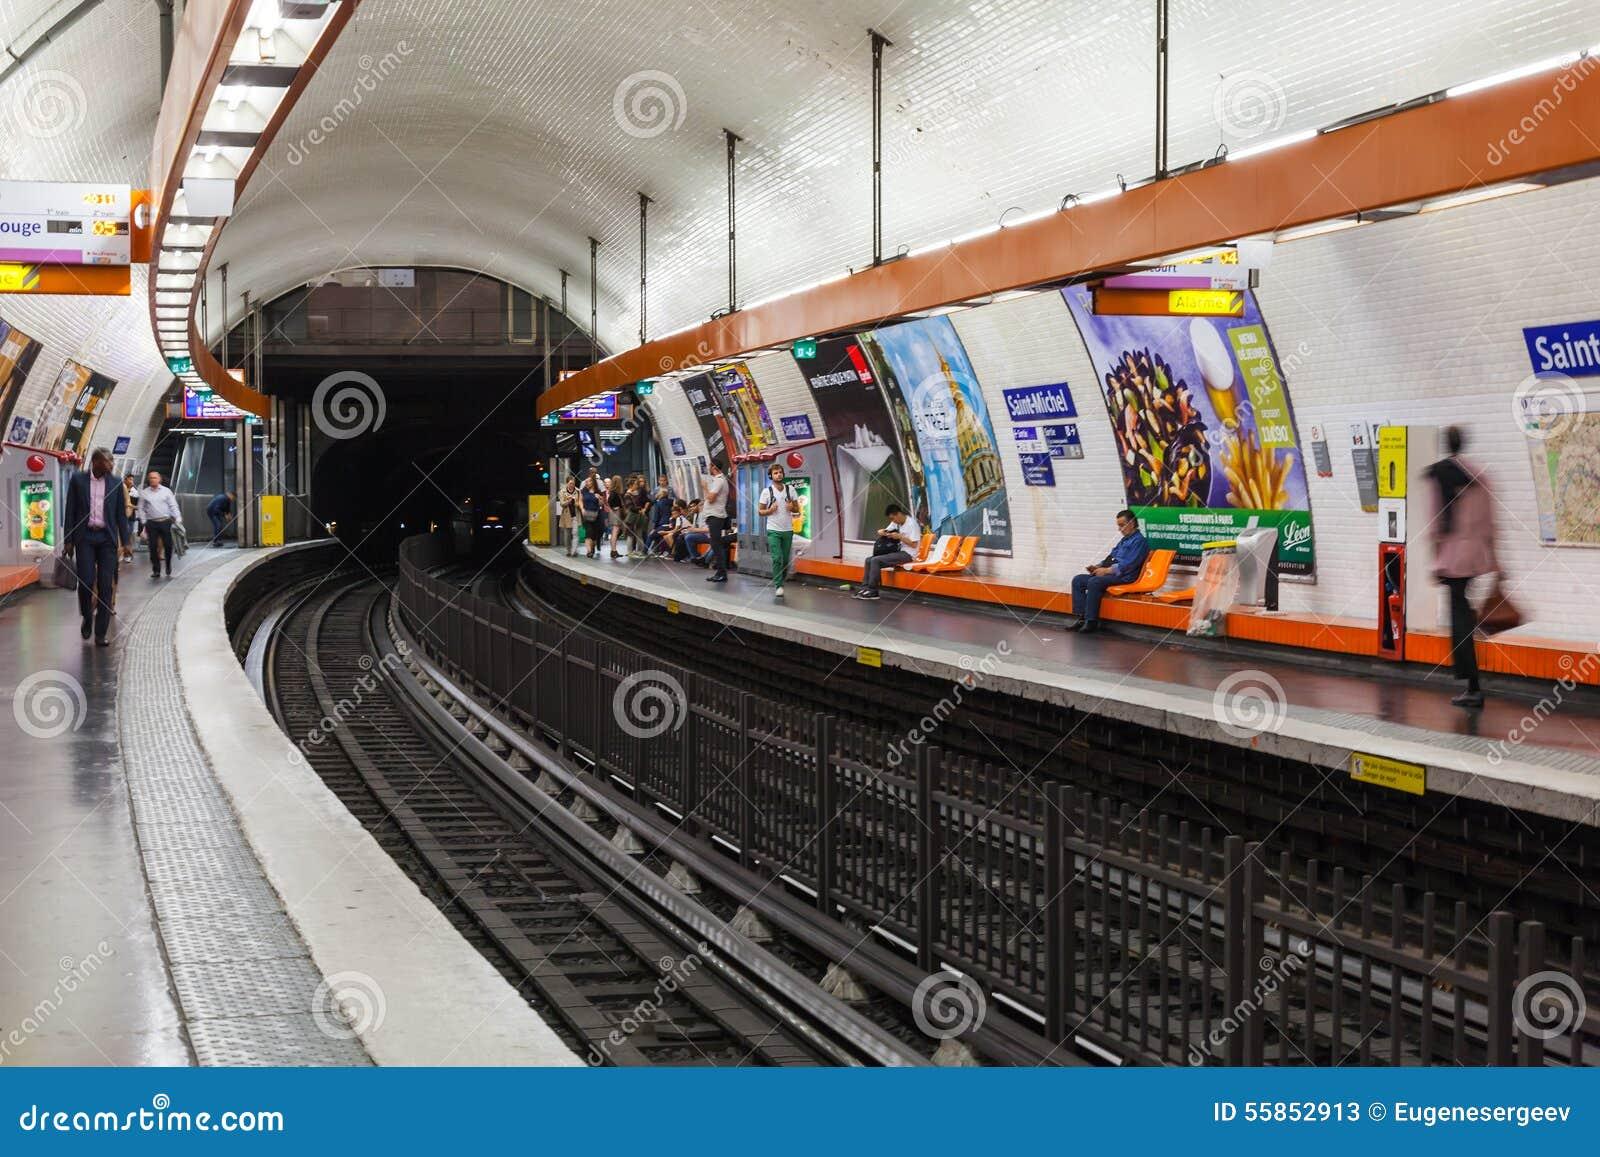 Saint michel estaci n de metro parisiense foto de archivo editorial imagen 55852913 - Saint michel paris metro ...